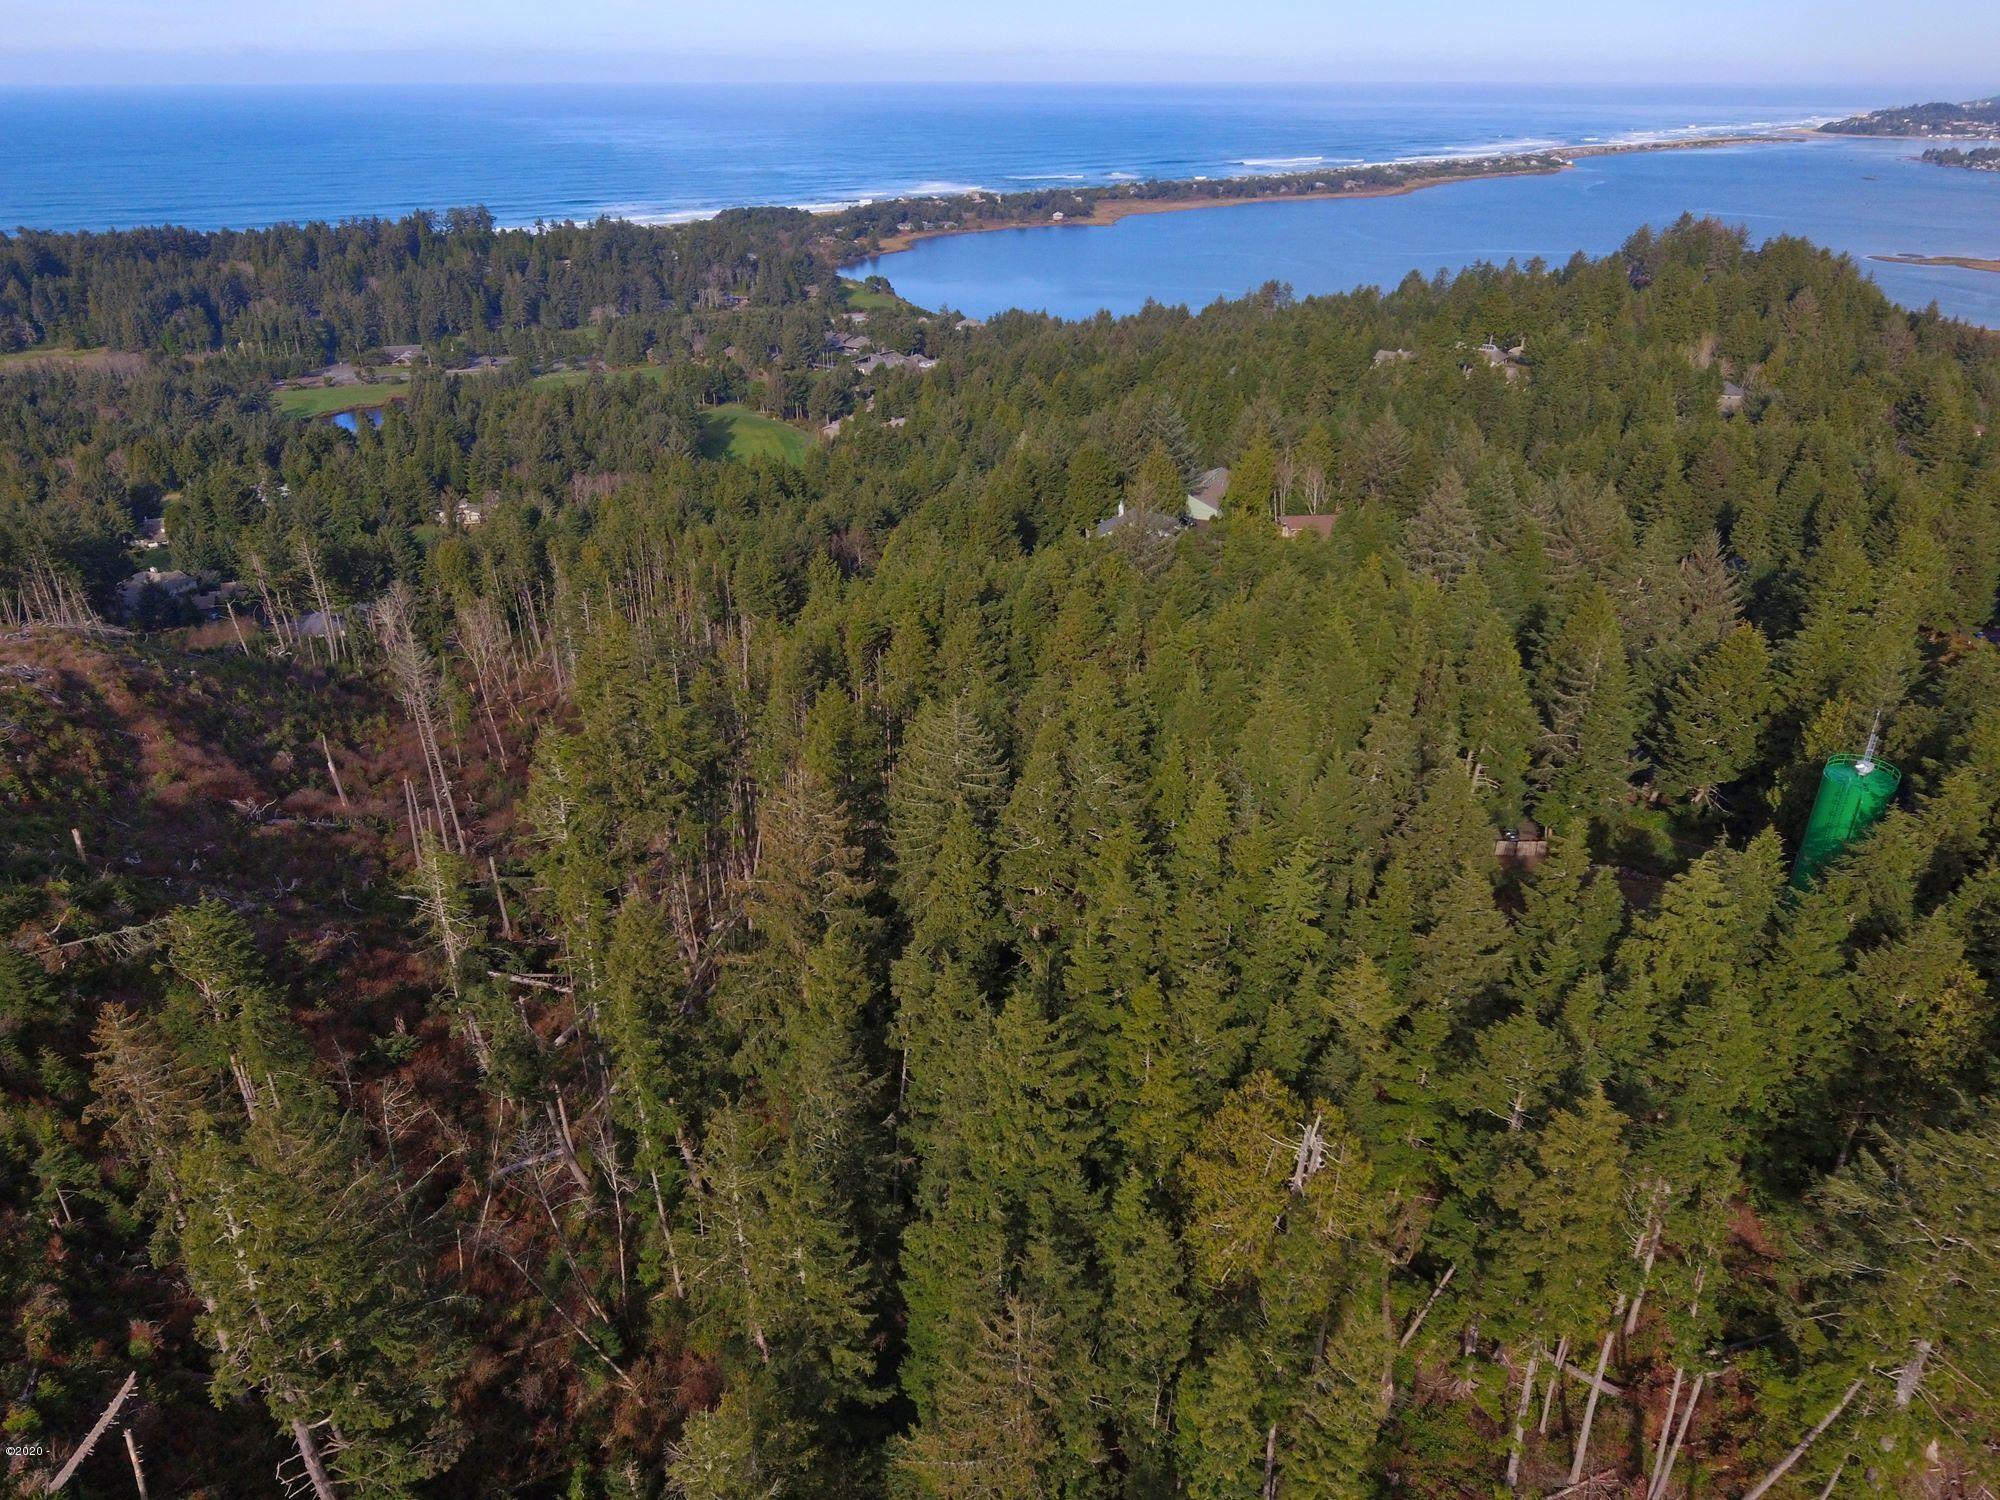 520 Ocean View Lane, Gleneden Beach, OR 97388 - Aerial View